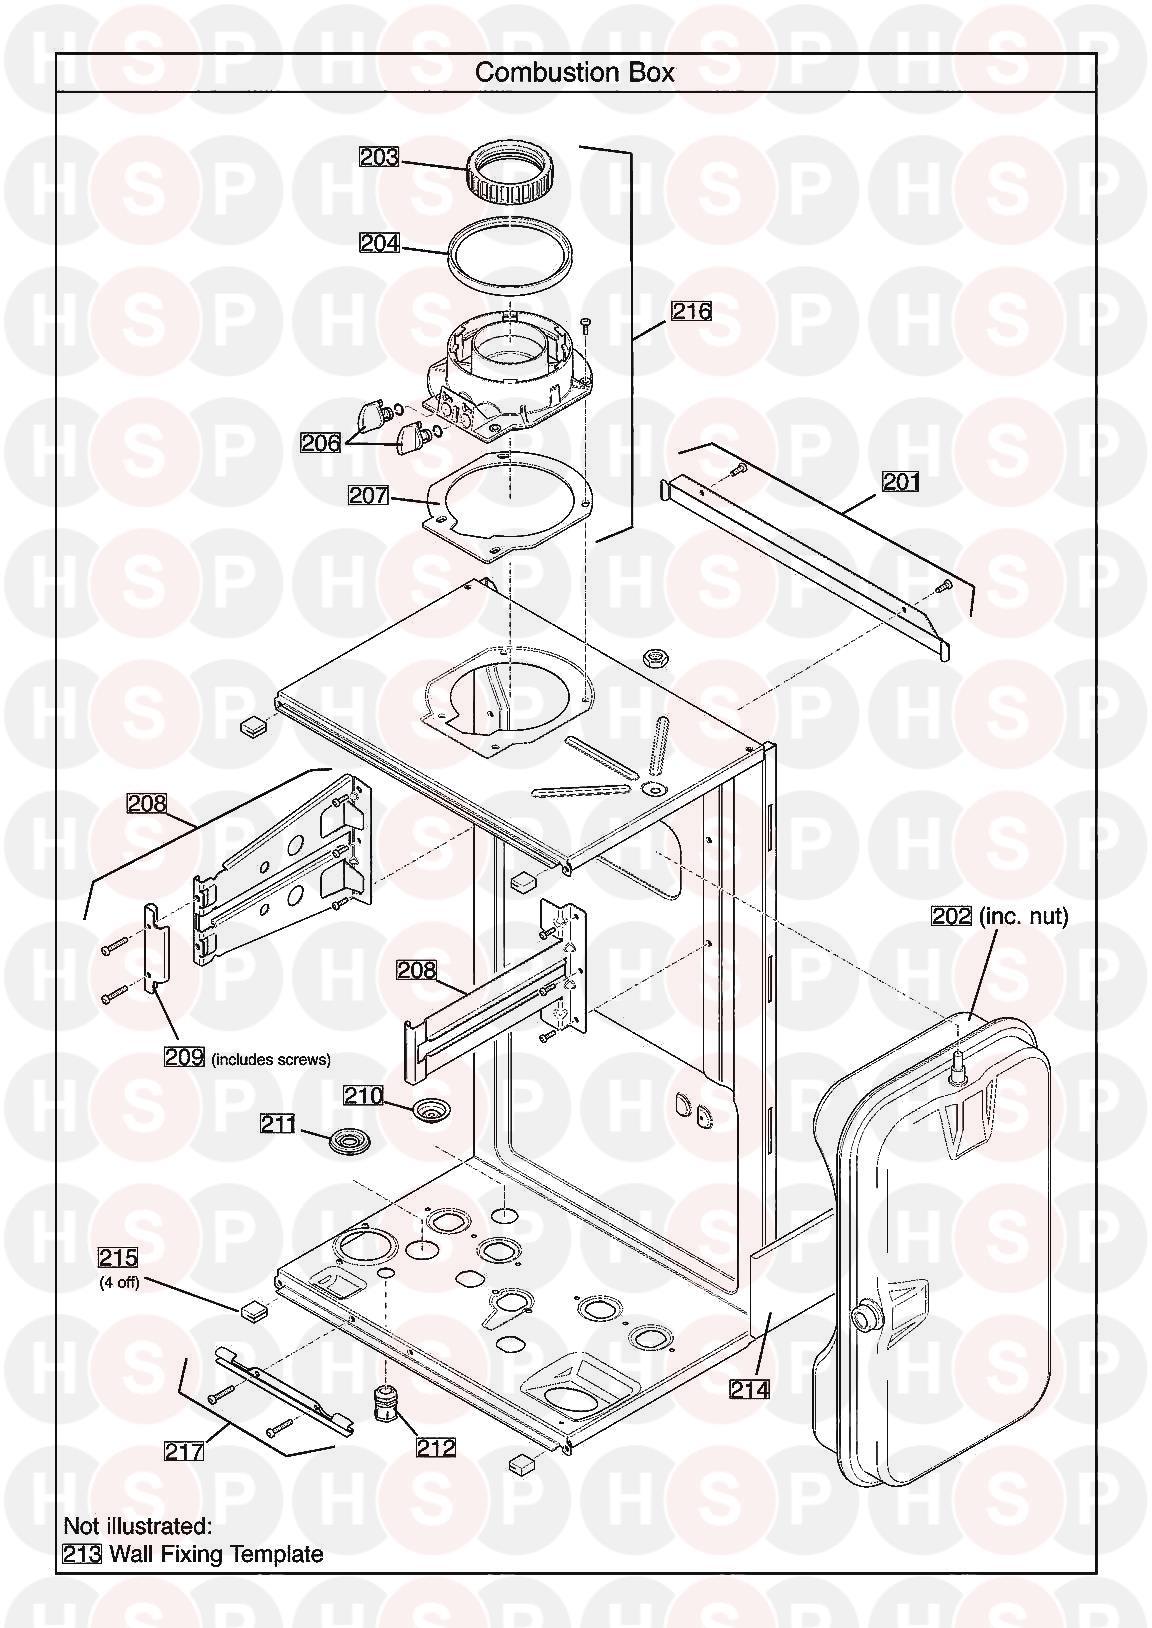 baxi megaflo 2 system 18 compact ga  combustion box